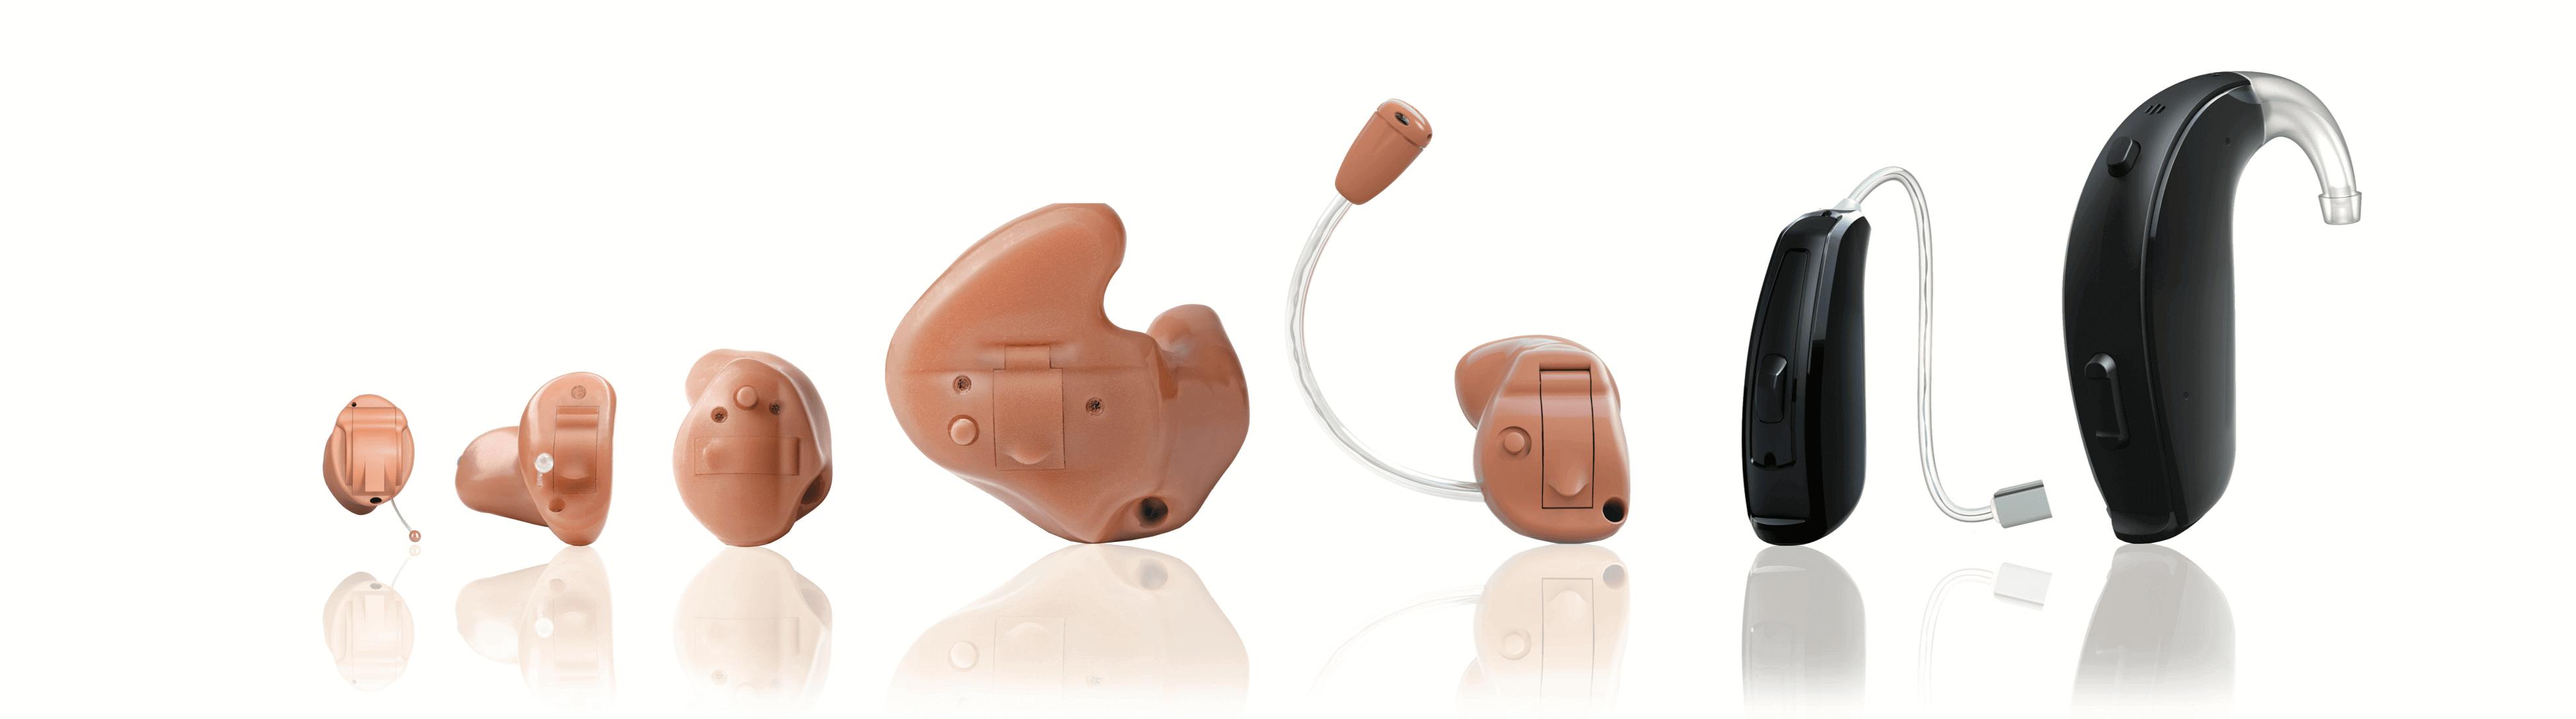 hearing-aid-styles best بهترین مارک و مدل سمعک